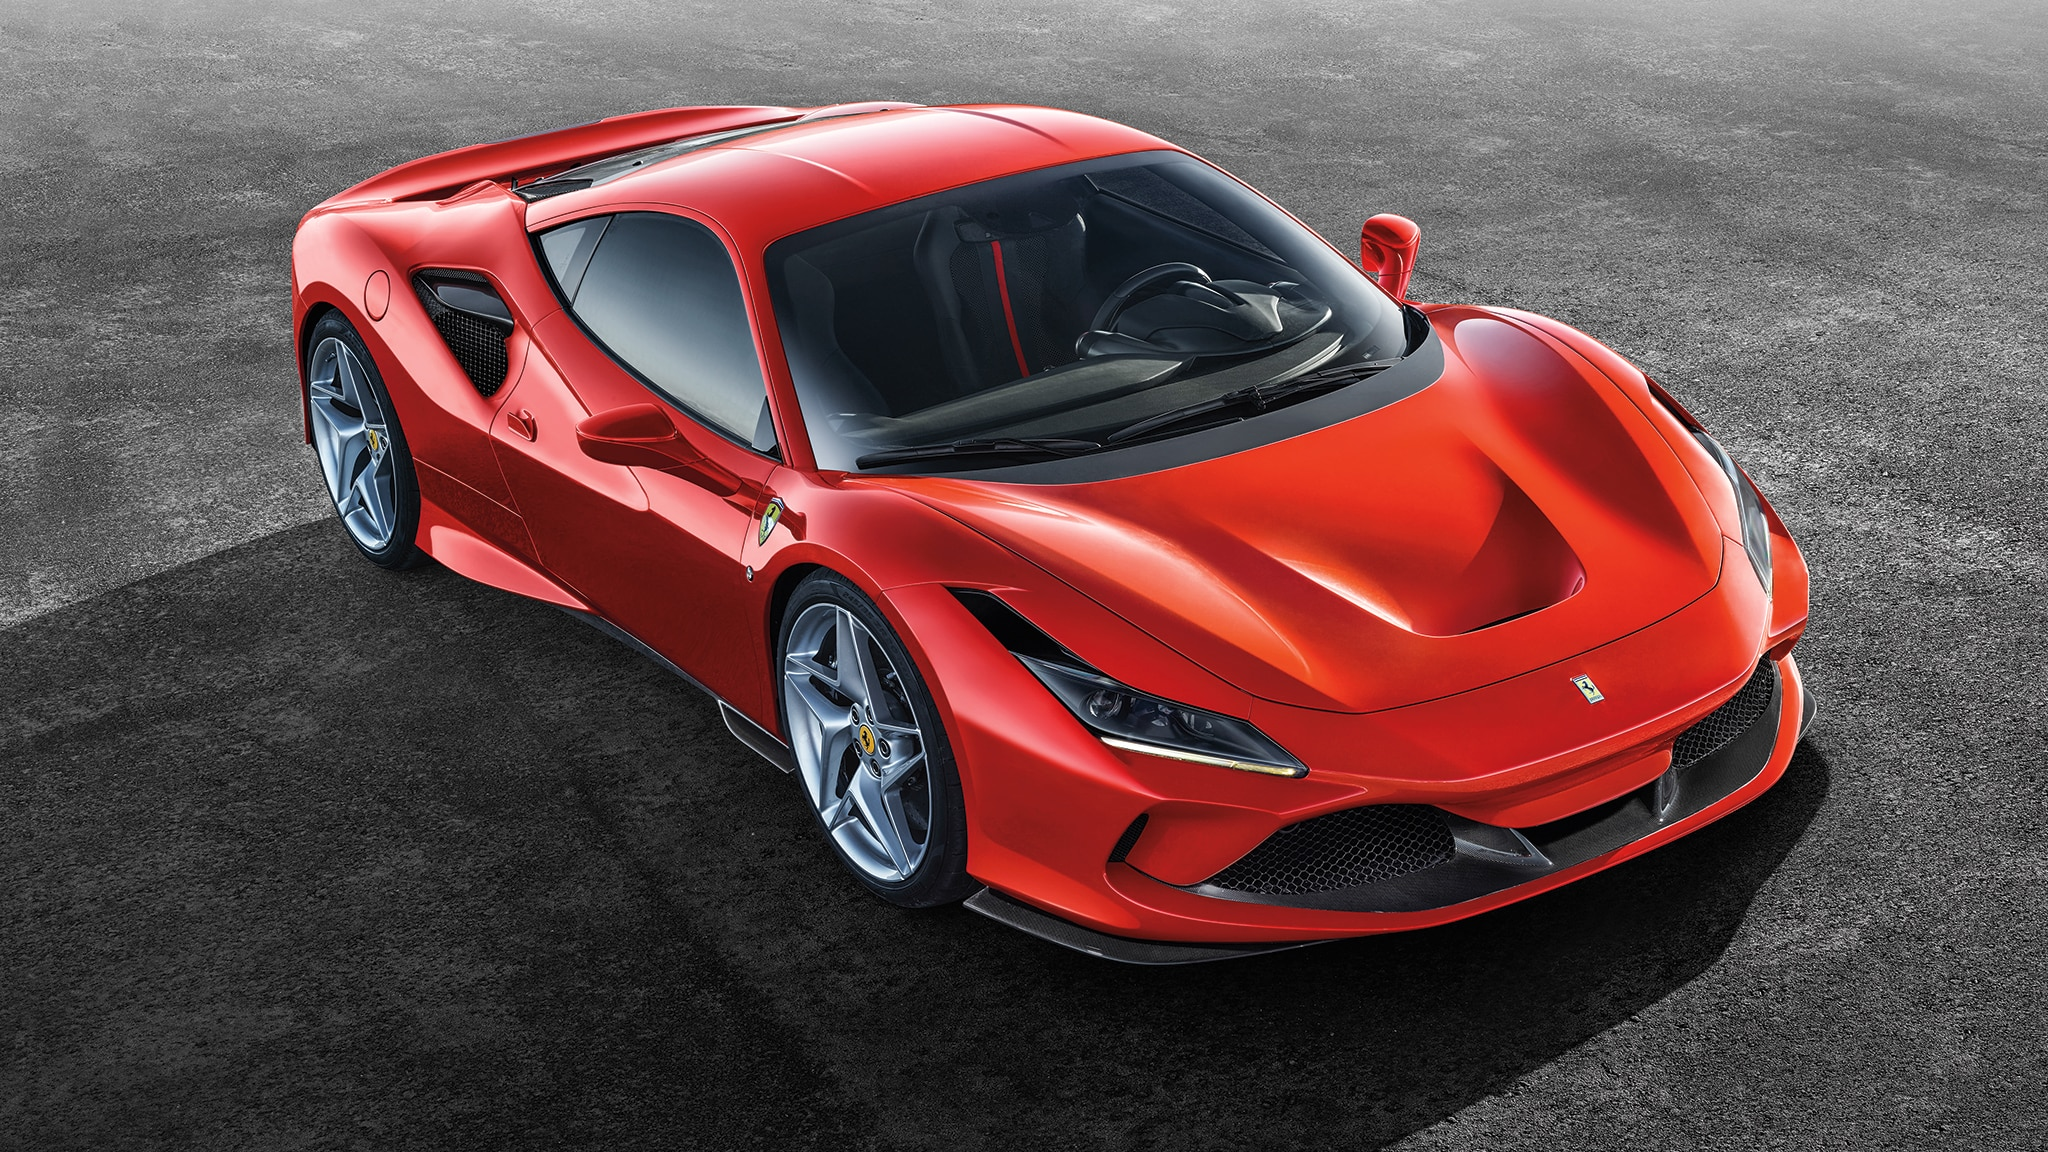 2022 Ferrari Purosangue SUV Renderings + Rumors